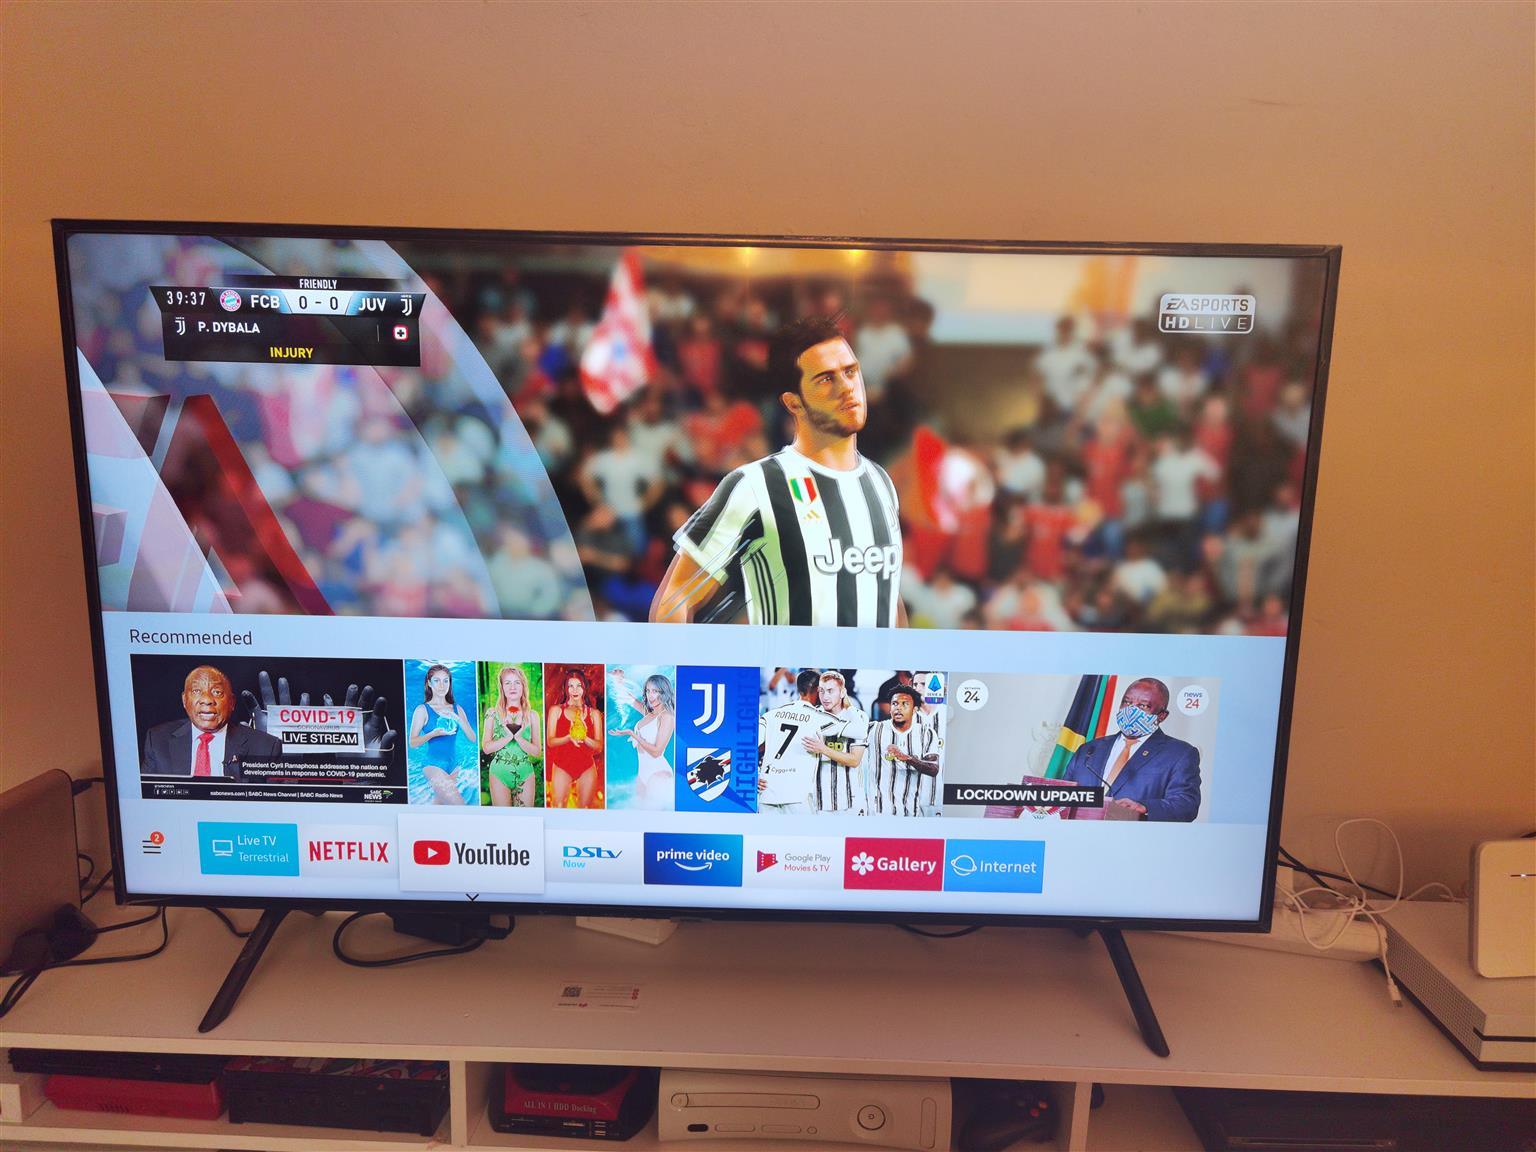 Samsung 55 inch uhd smart tv brand new in the box